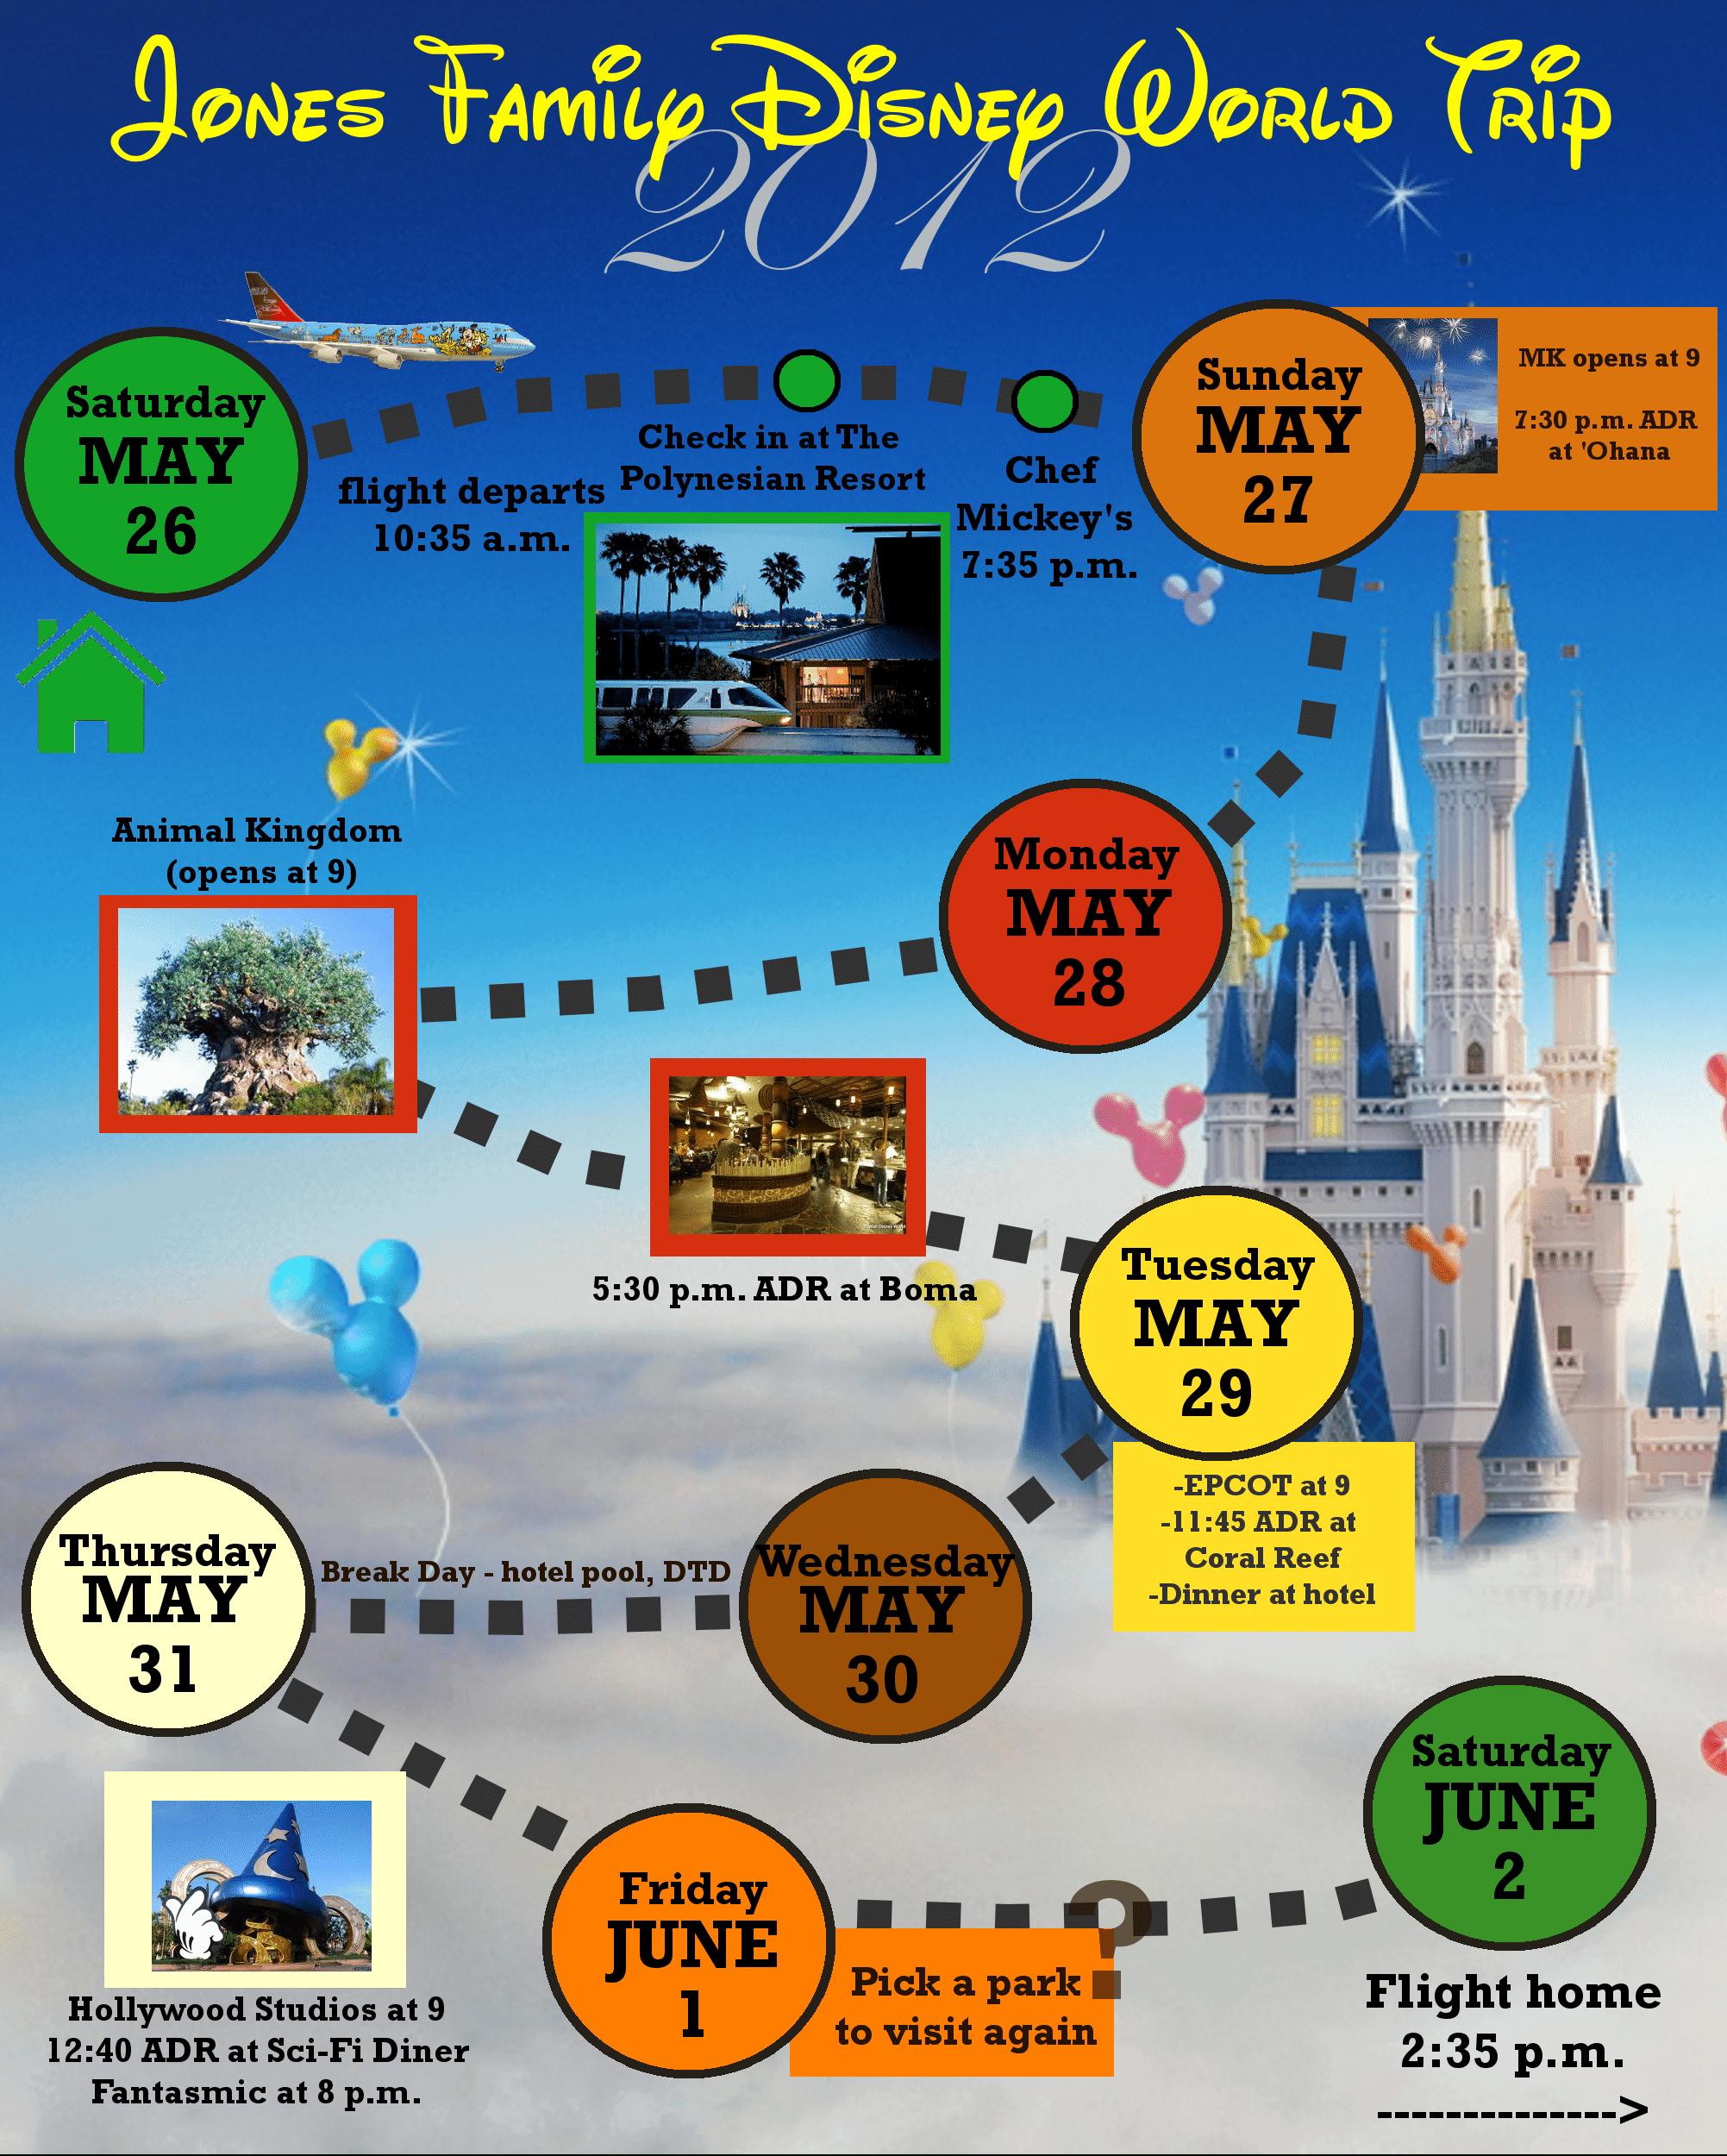 2 Custom Disney World Itinerary Templates | Wdw Prep School in Disney World Itinerary Template Blank